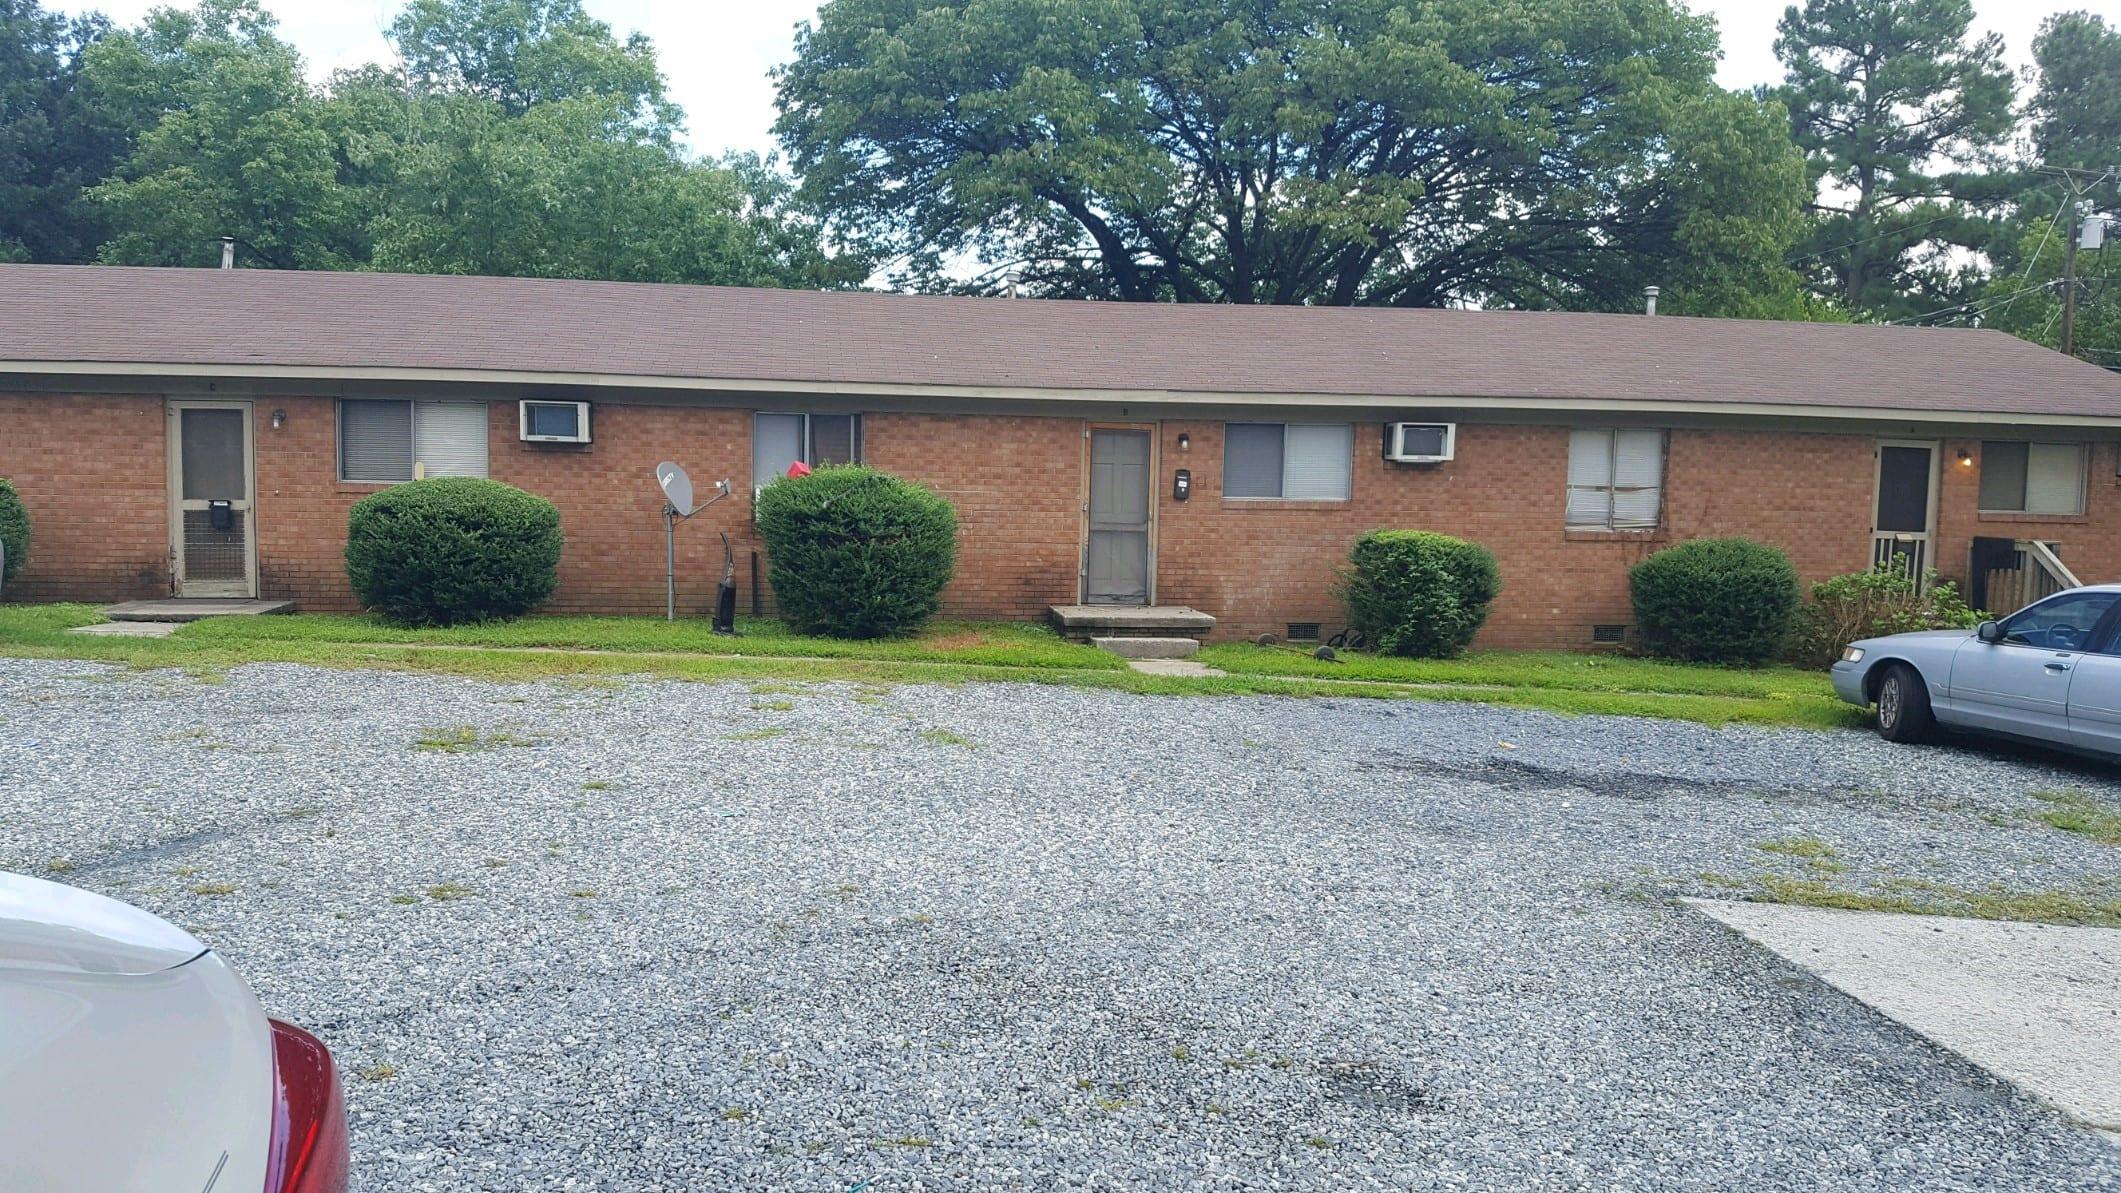 1807 Ryan Street Apt. 2 Greensboro NC 27406